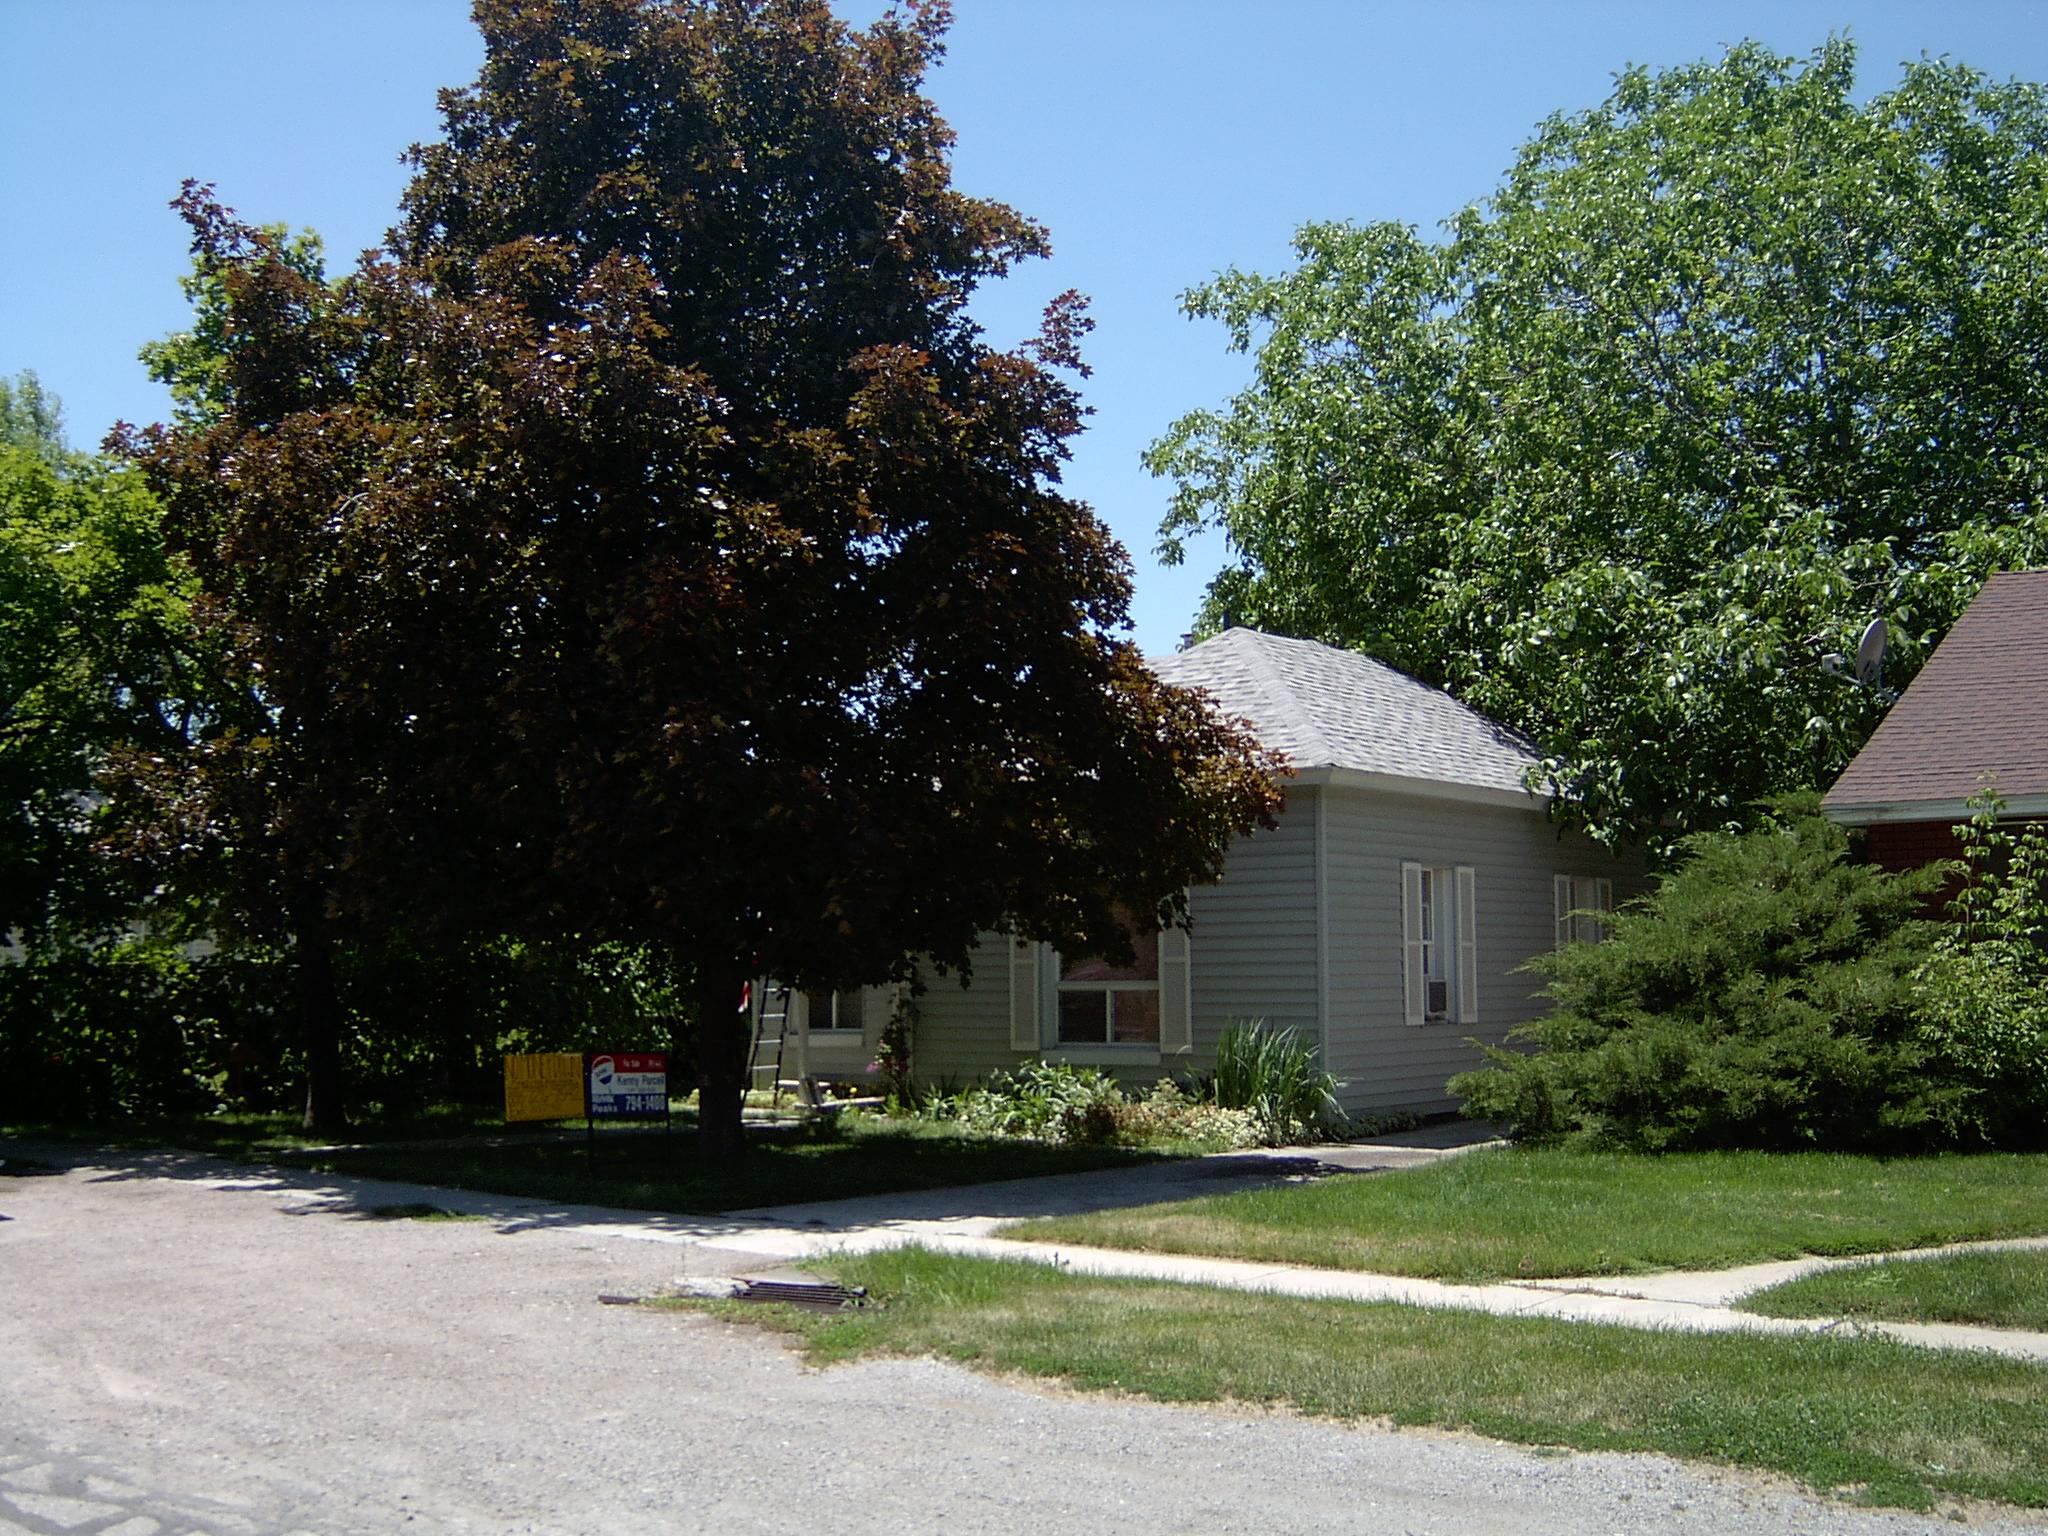 2004-1399P.JPG